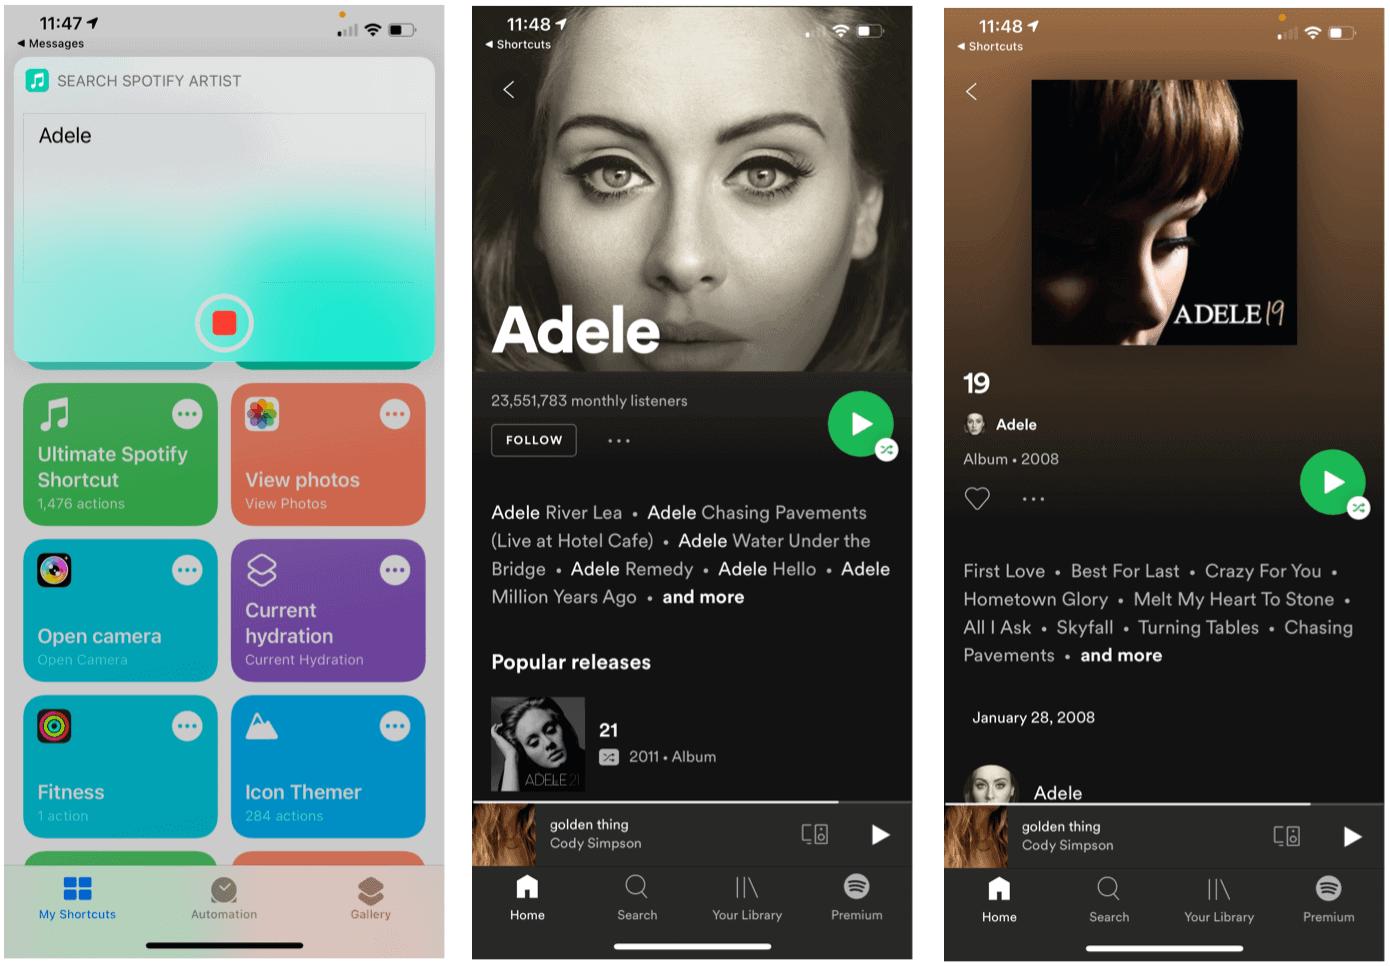 Siri Shortcuts for Spotify Siri search artist